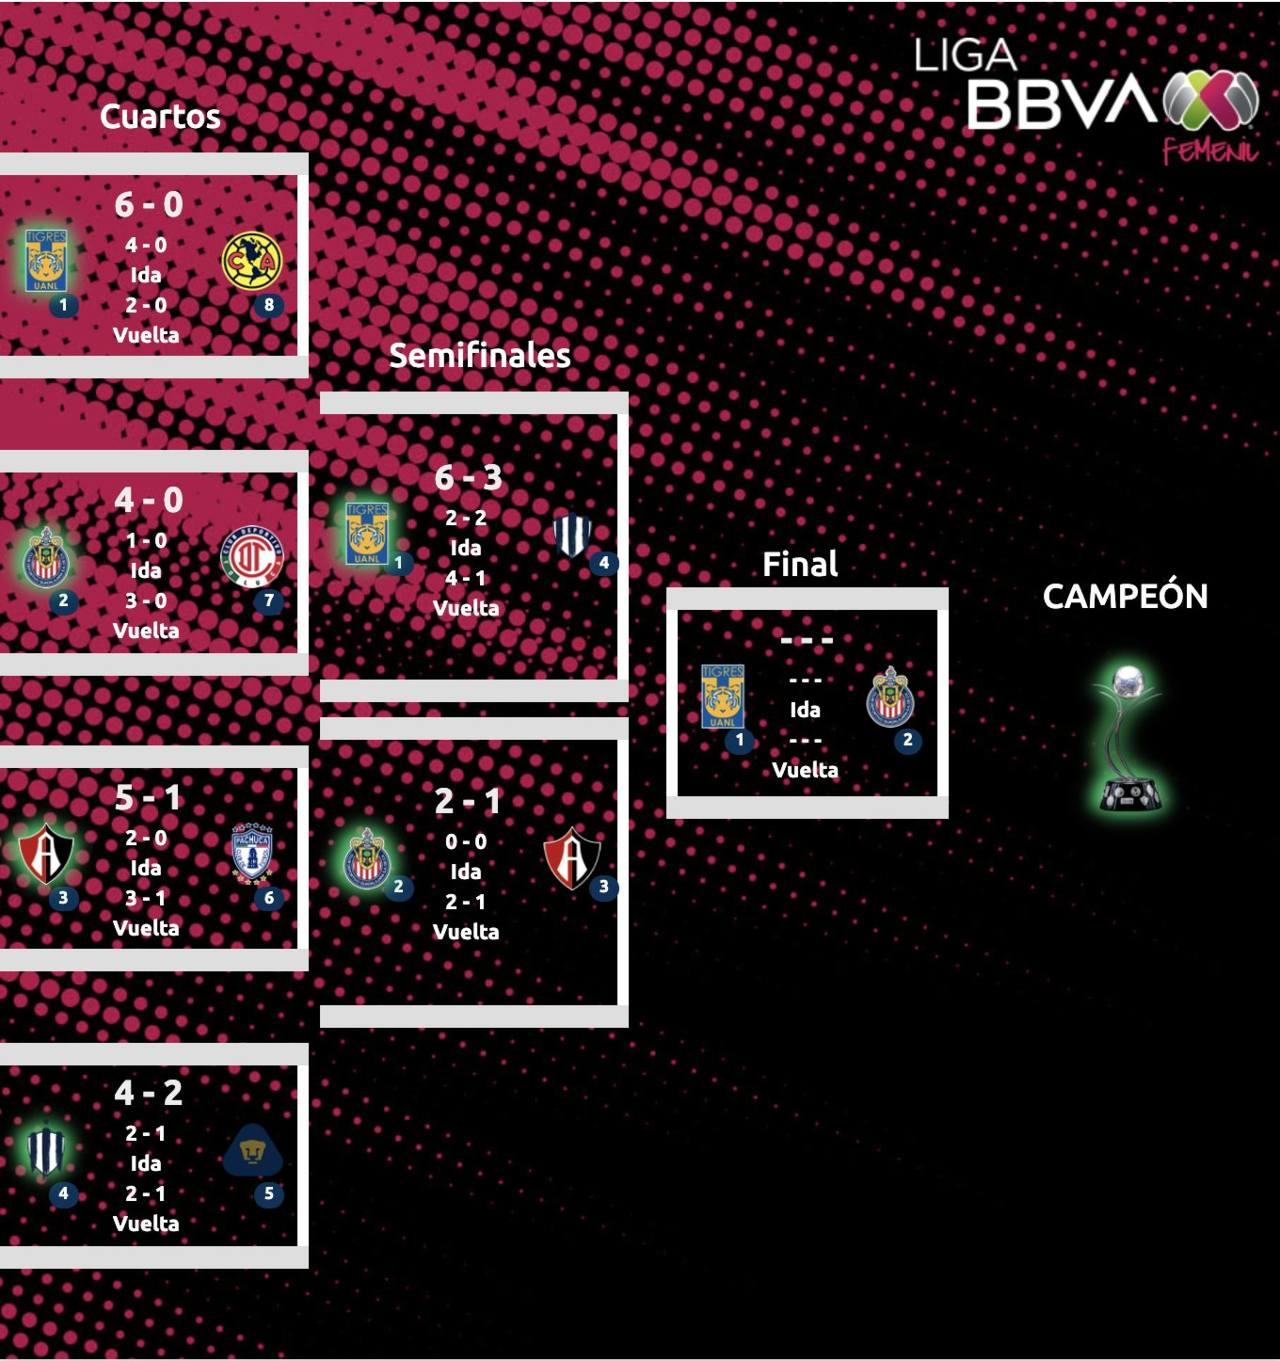 Liga BBVA MX Femenil final Tigres Chivas horarios